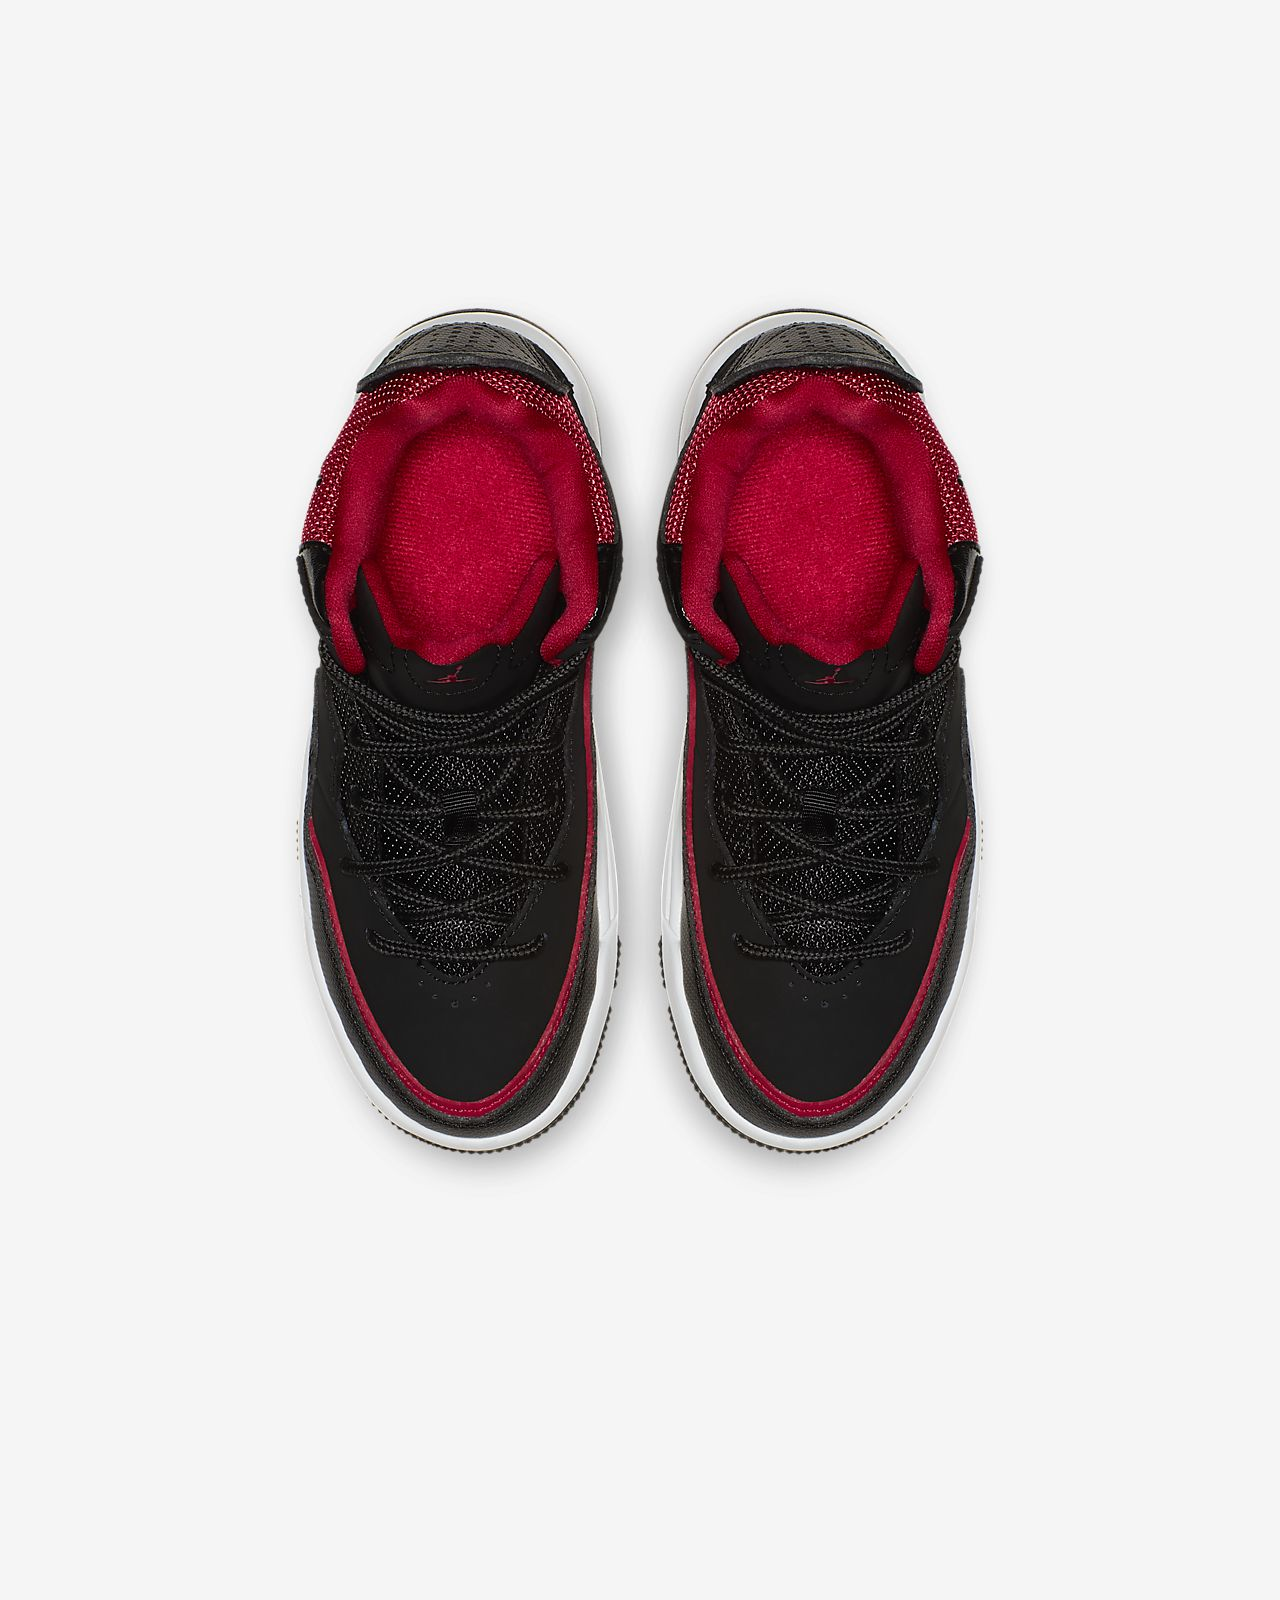 3365d9fad48 Jordan Courtside 23 Younger Kids' Shoe. Nike.com AU